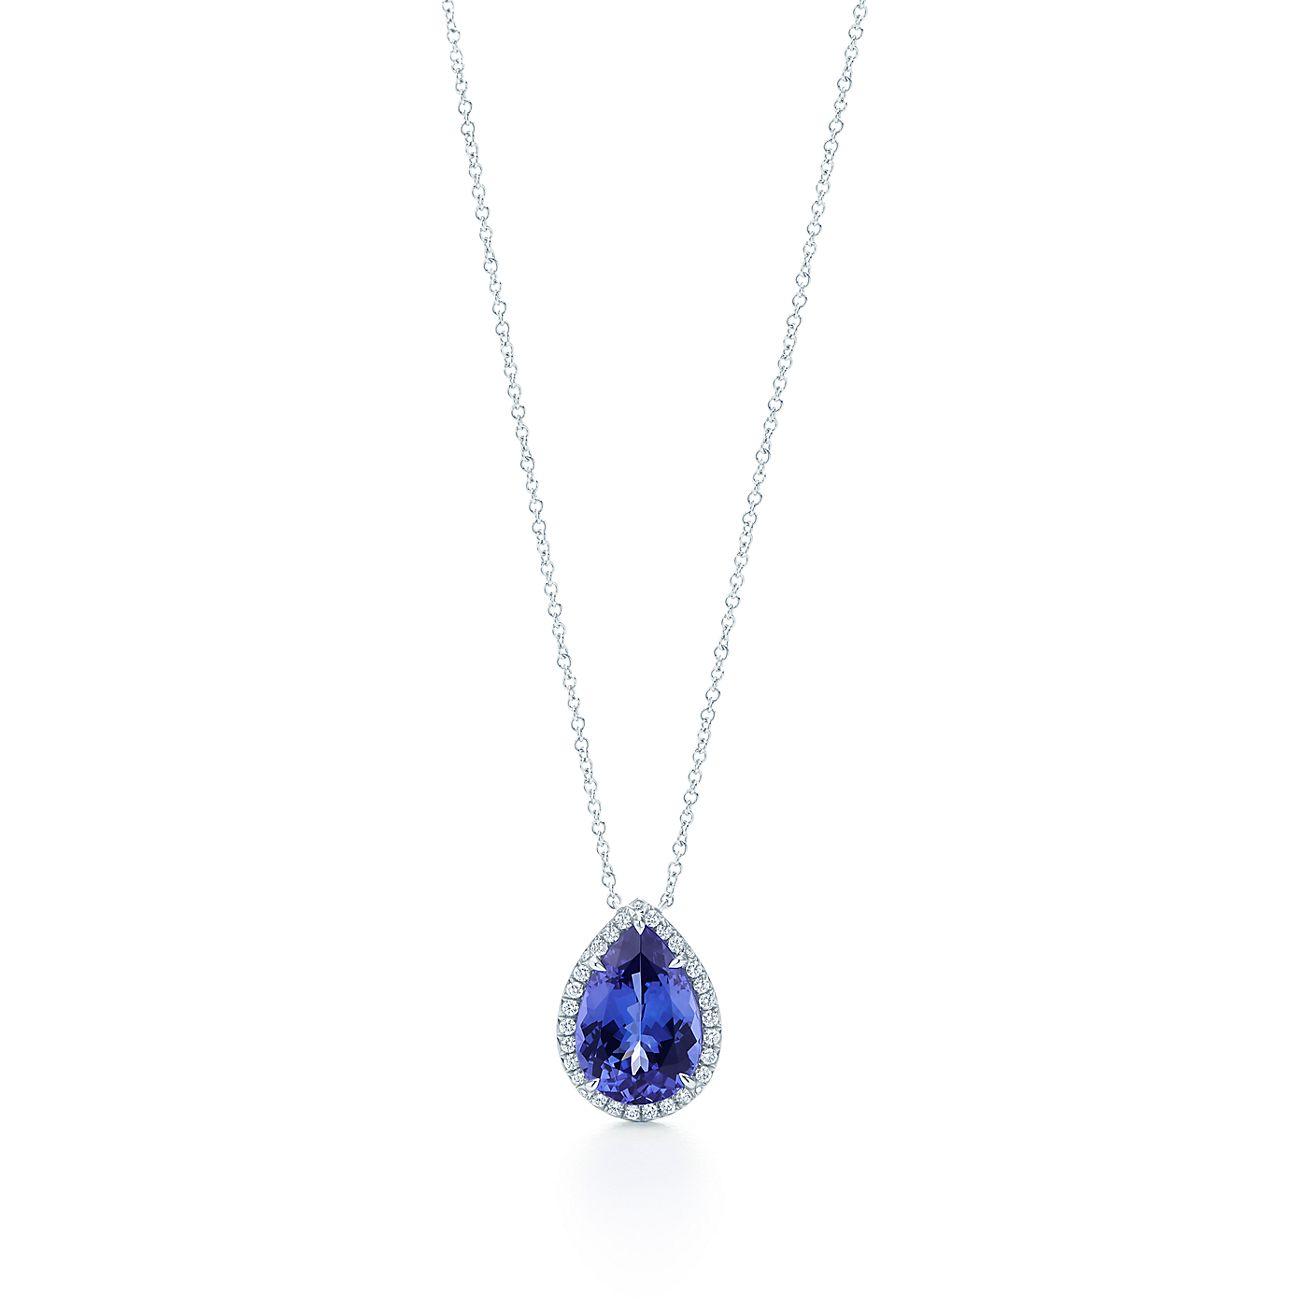 7948198bd Tiffany Soleste Pendant In Platinum With A Tanzanite And Diamonds